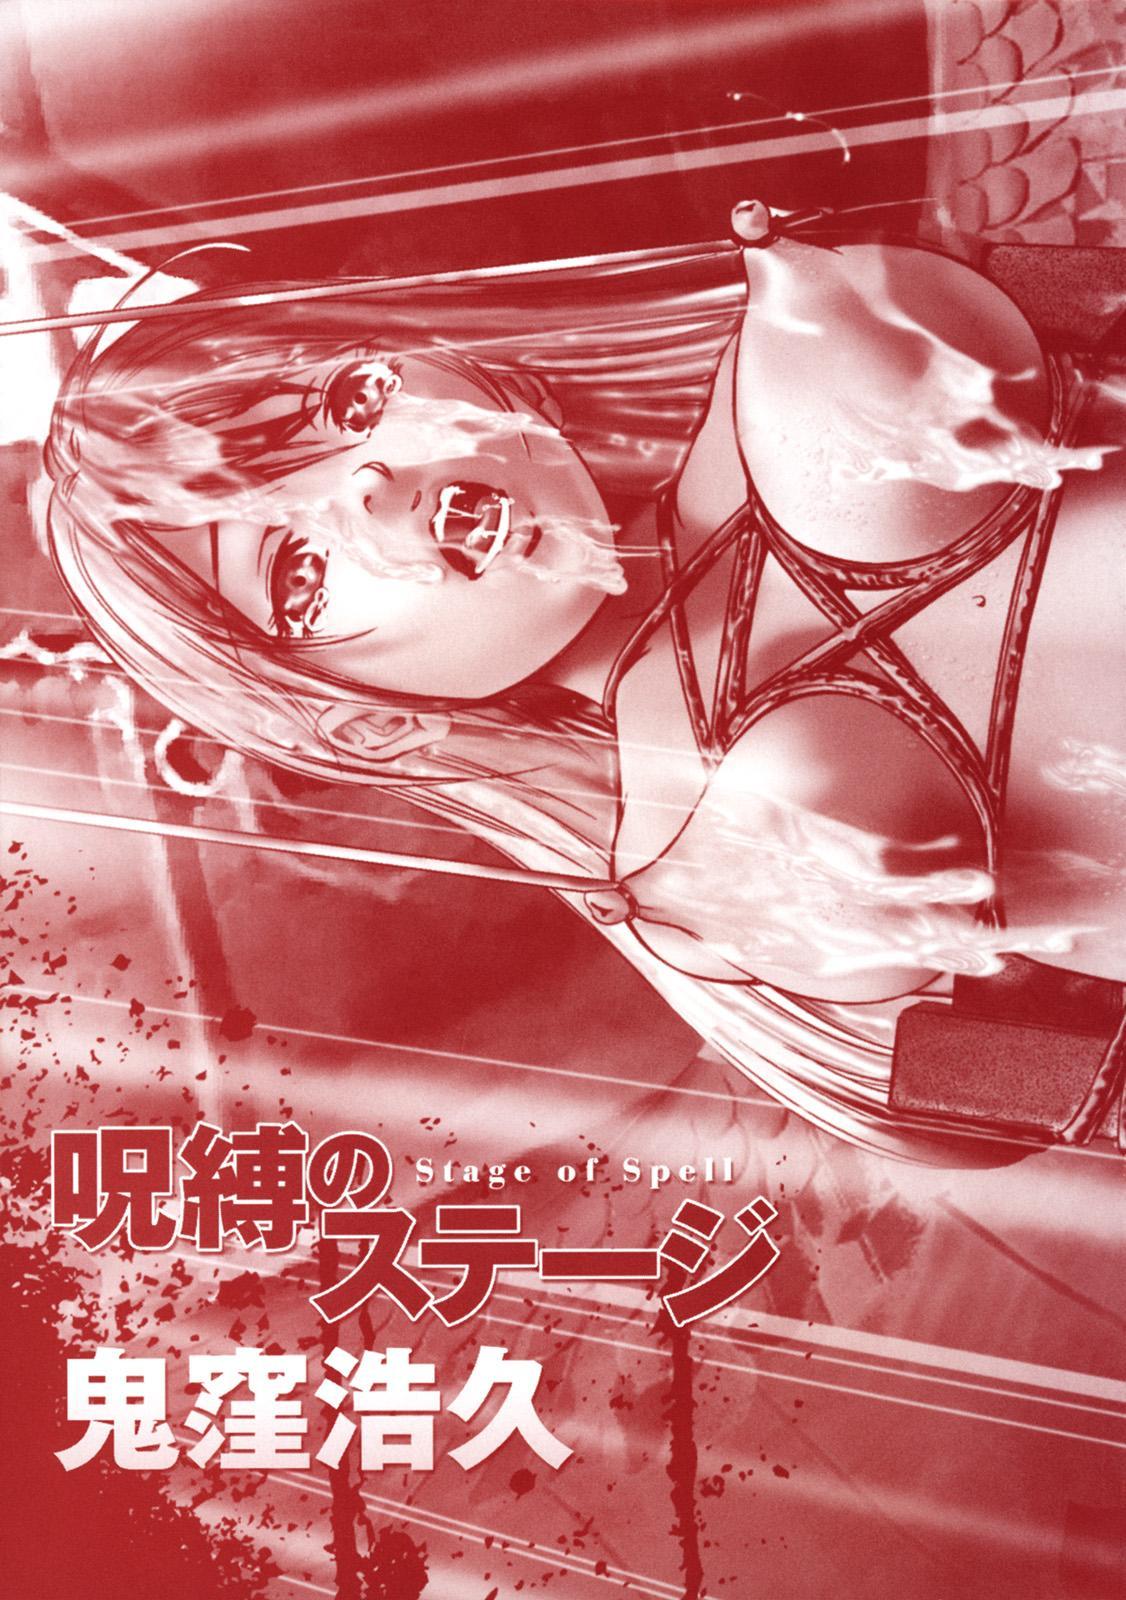 Jubaku no Stage - Reward of Blood 2